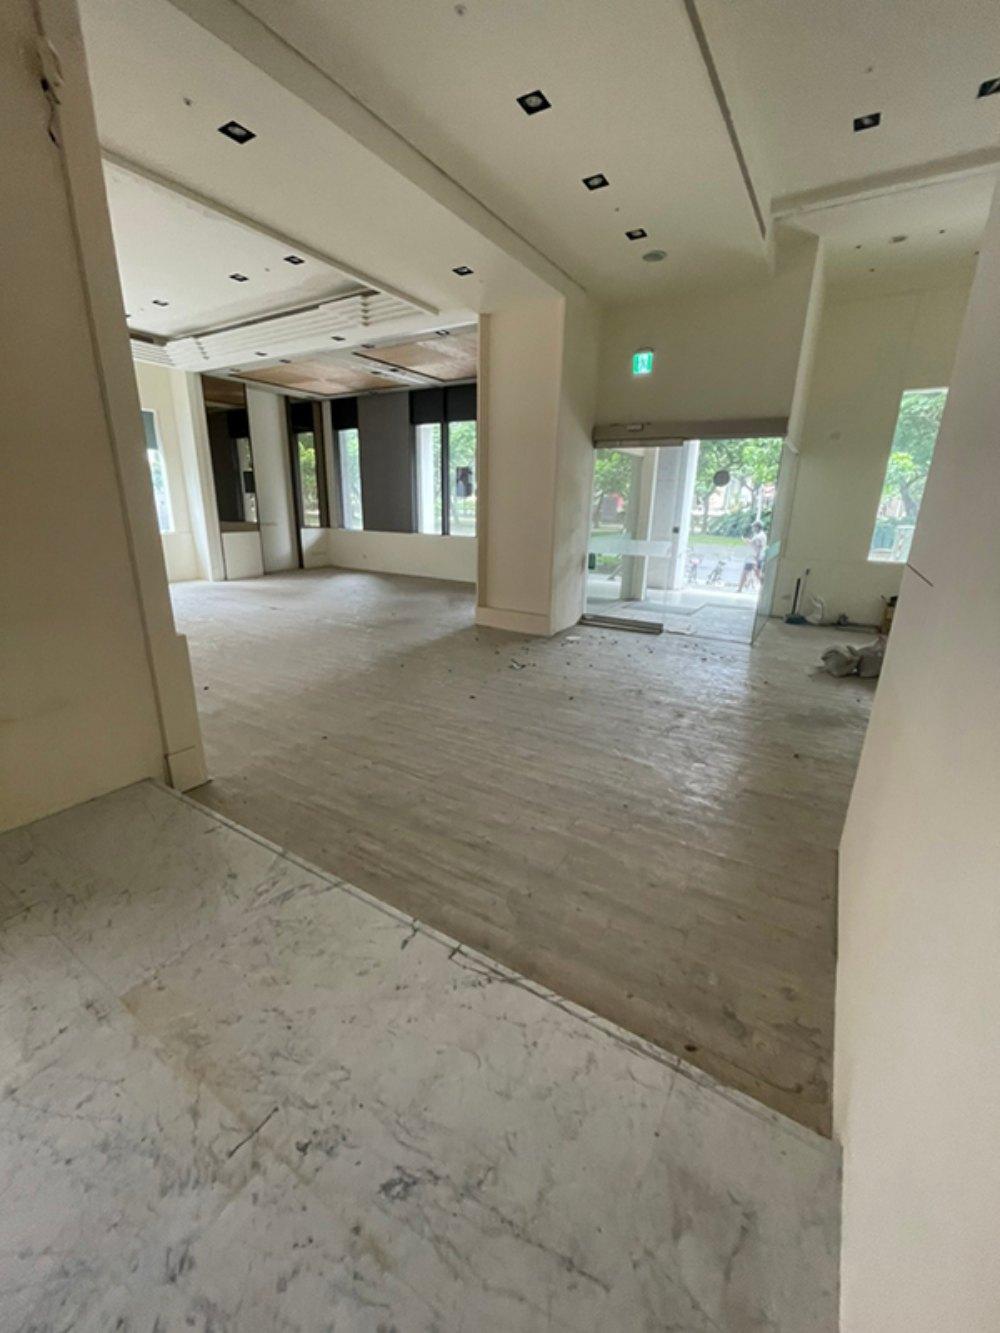 RE0144-租 遠企敦南氣派金店面-04